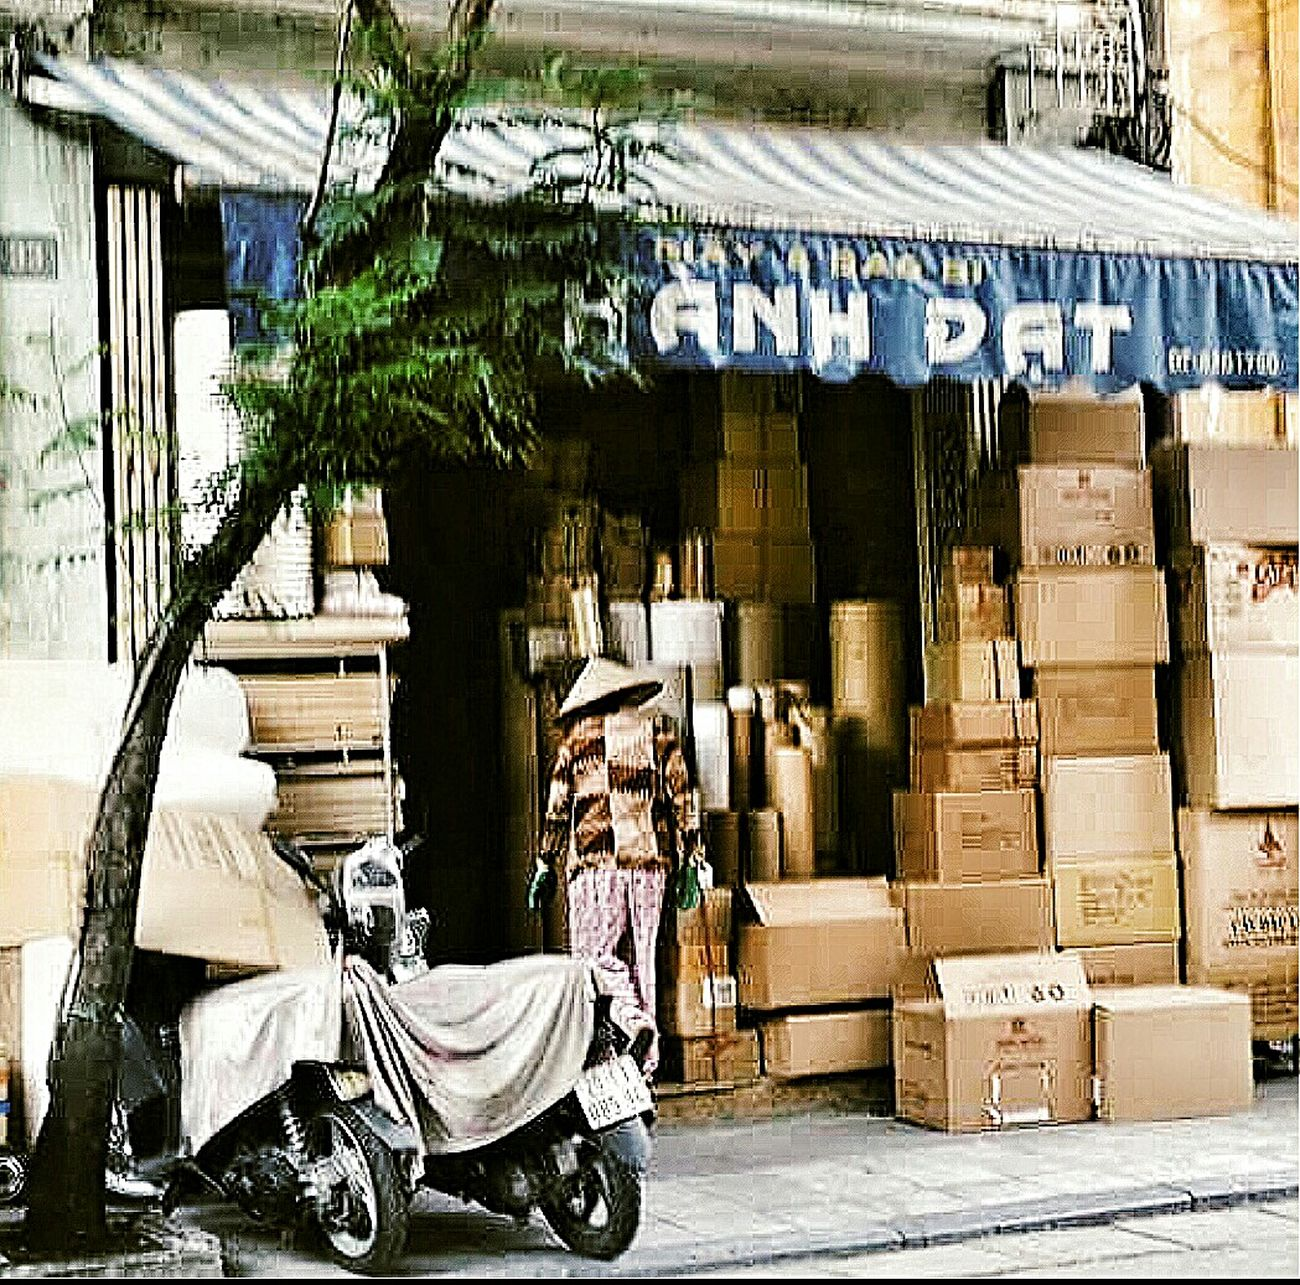 Shop Boxes Non La Hanoi Vietnam Travelphotography Streetphotography